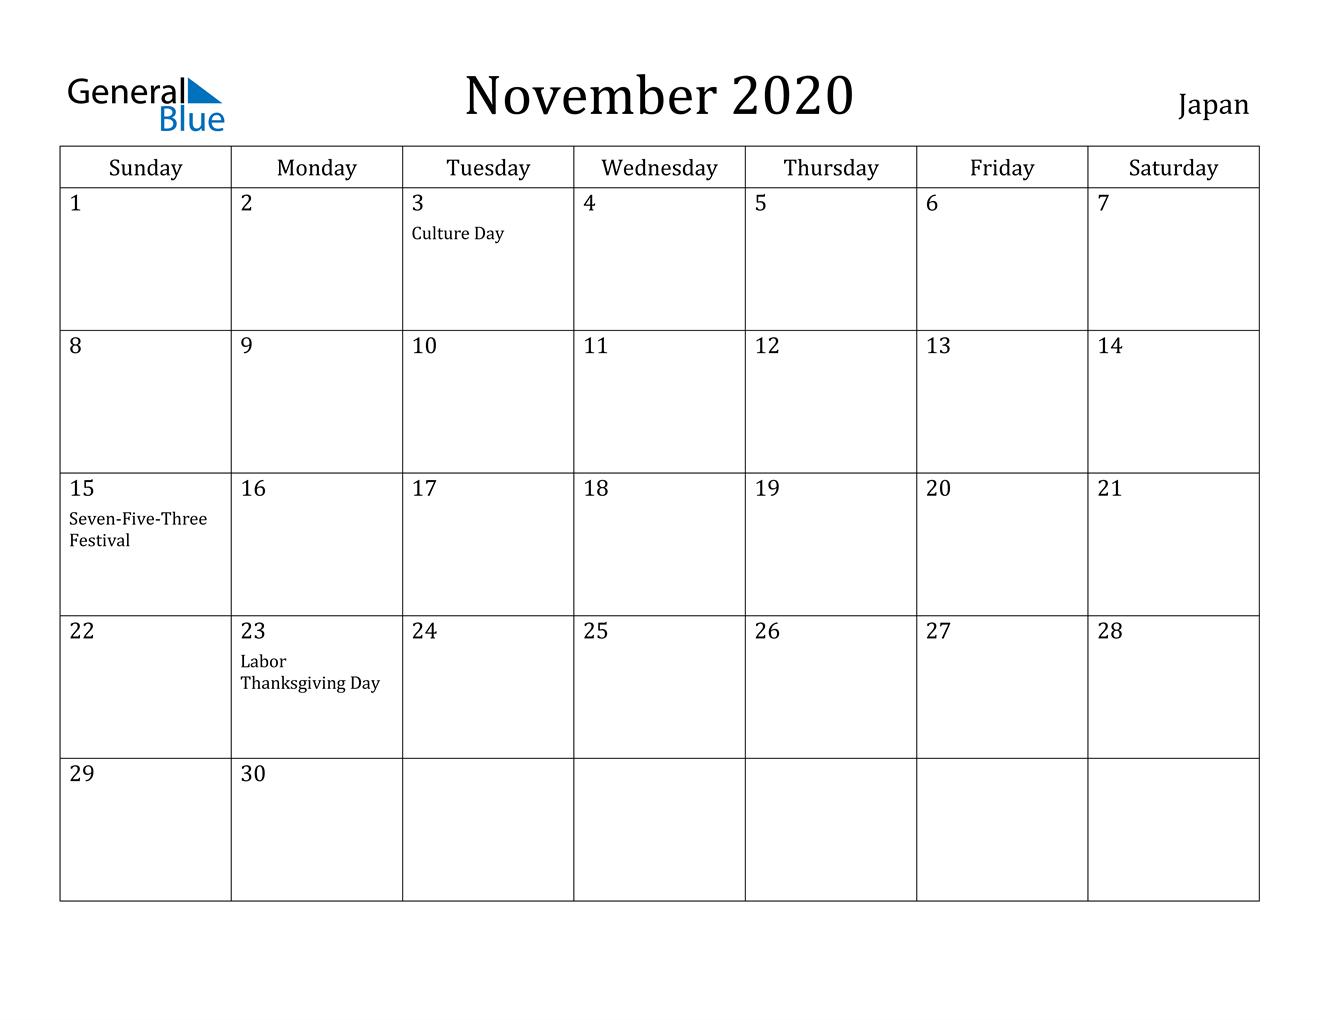 November 2020 Calendar - Japan